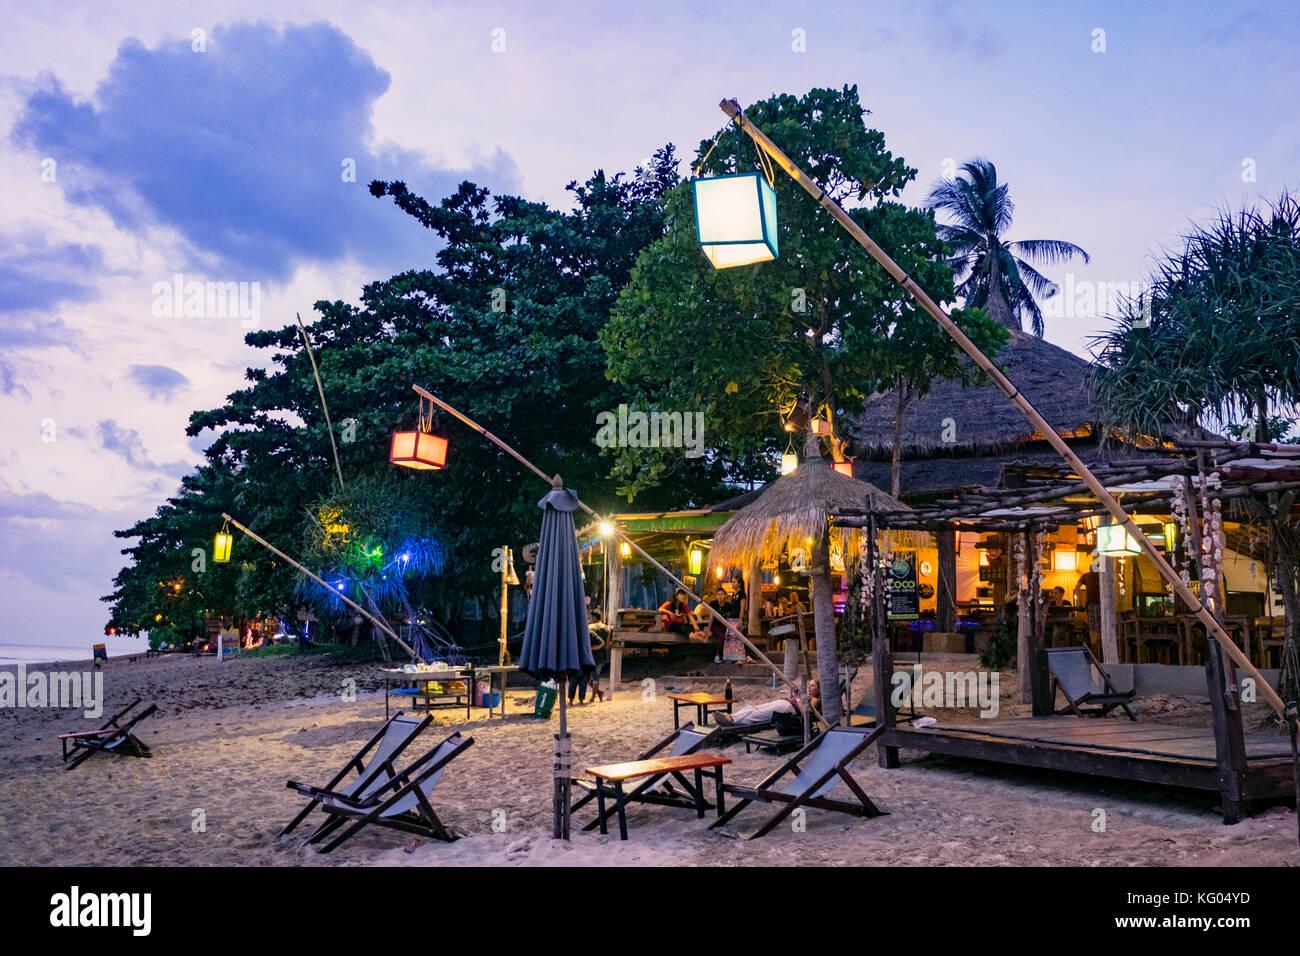 Tailandia. Mar de Andamán. Isla de Koh Lanta. La playa de Klong Khong Imagen De Stock